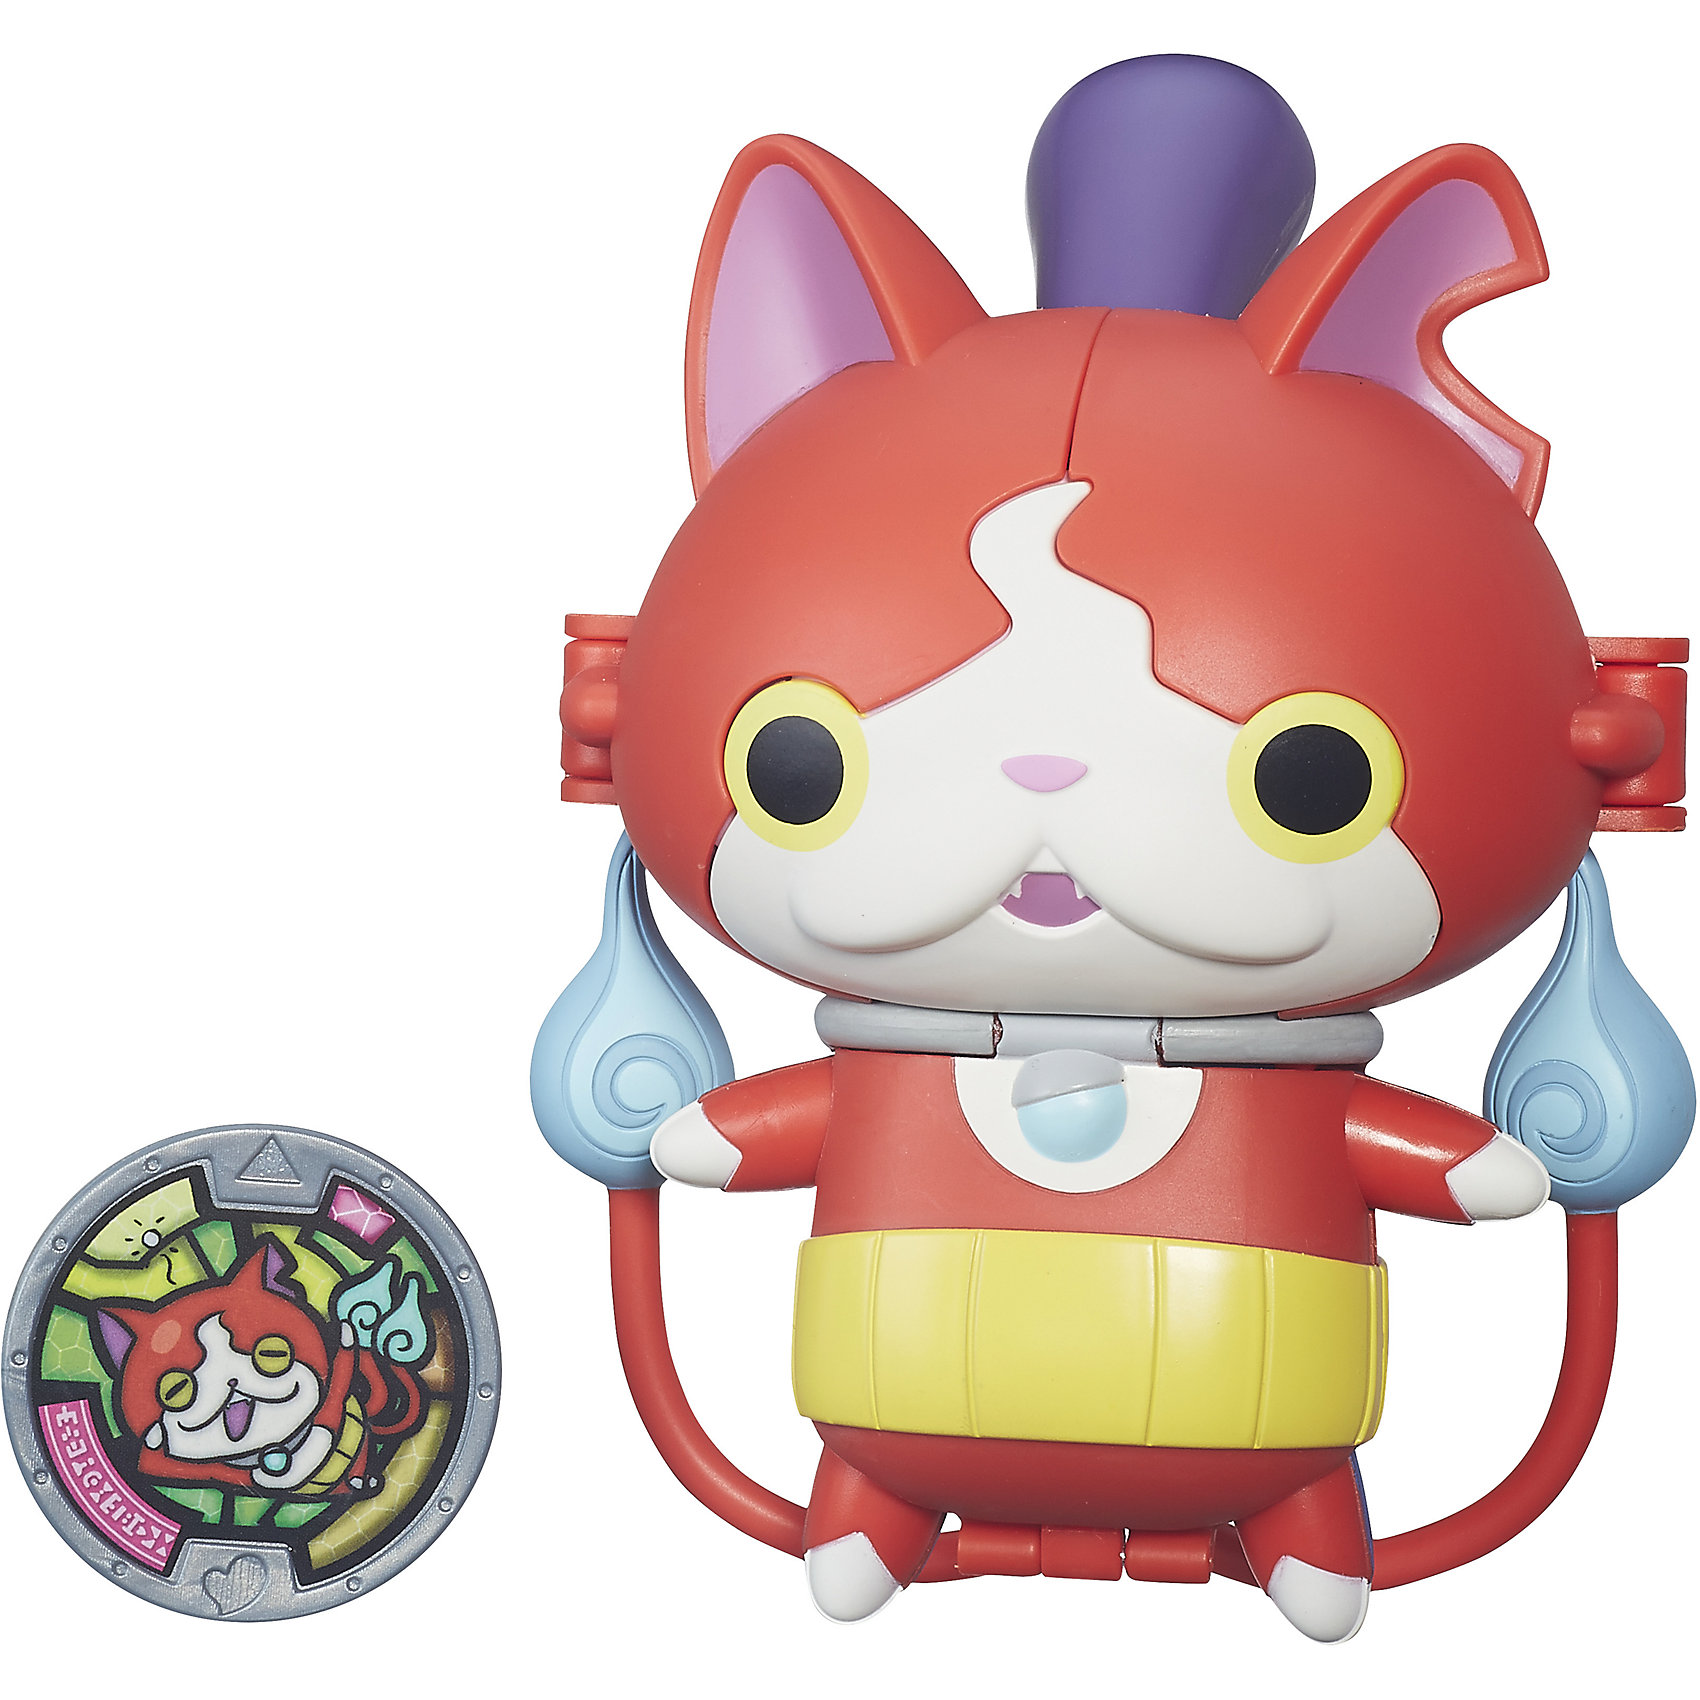 Hasbro Меняющаяся фигурка с медалью, Екай вотч, Jibanyan B5946/B5947